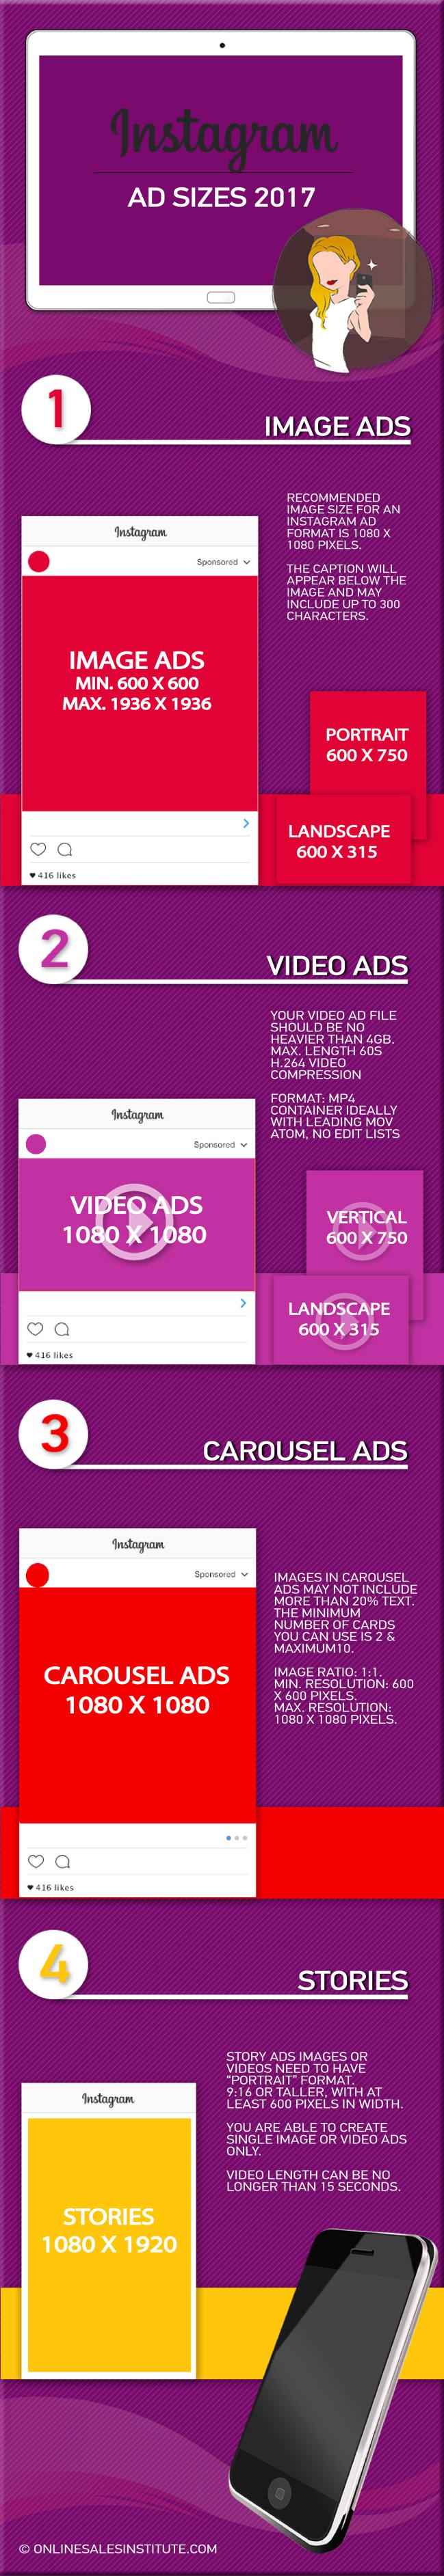 Instagram Ad Sizes 2017